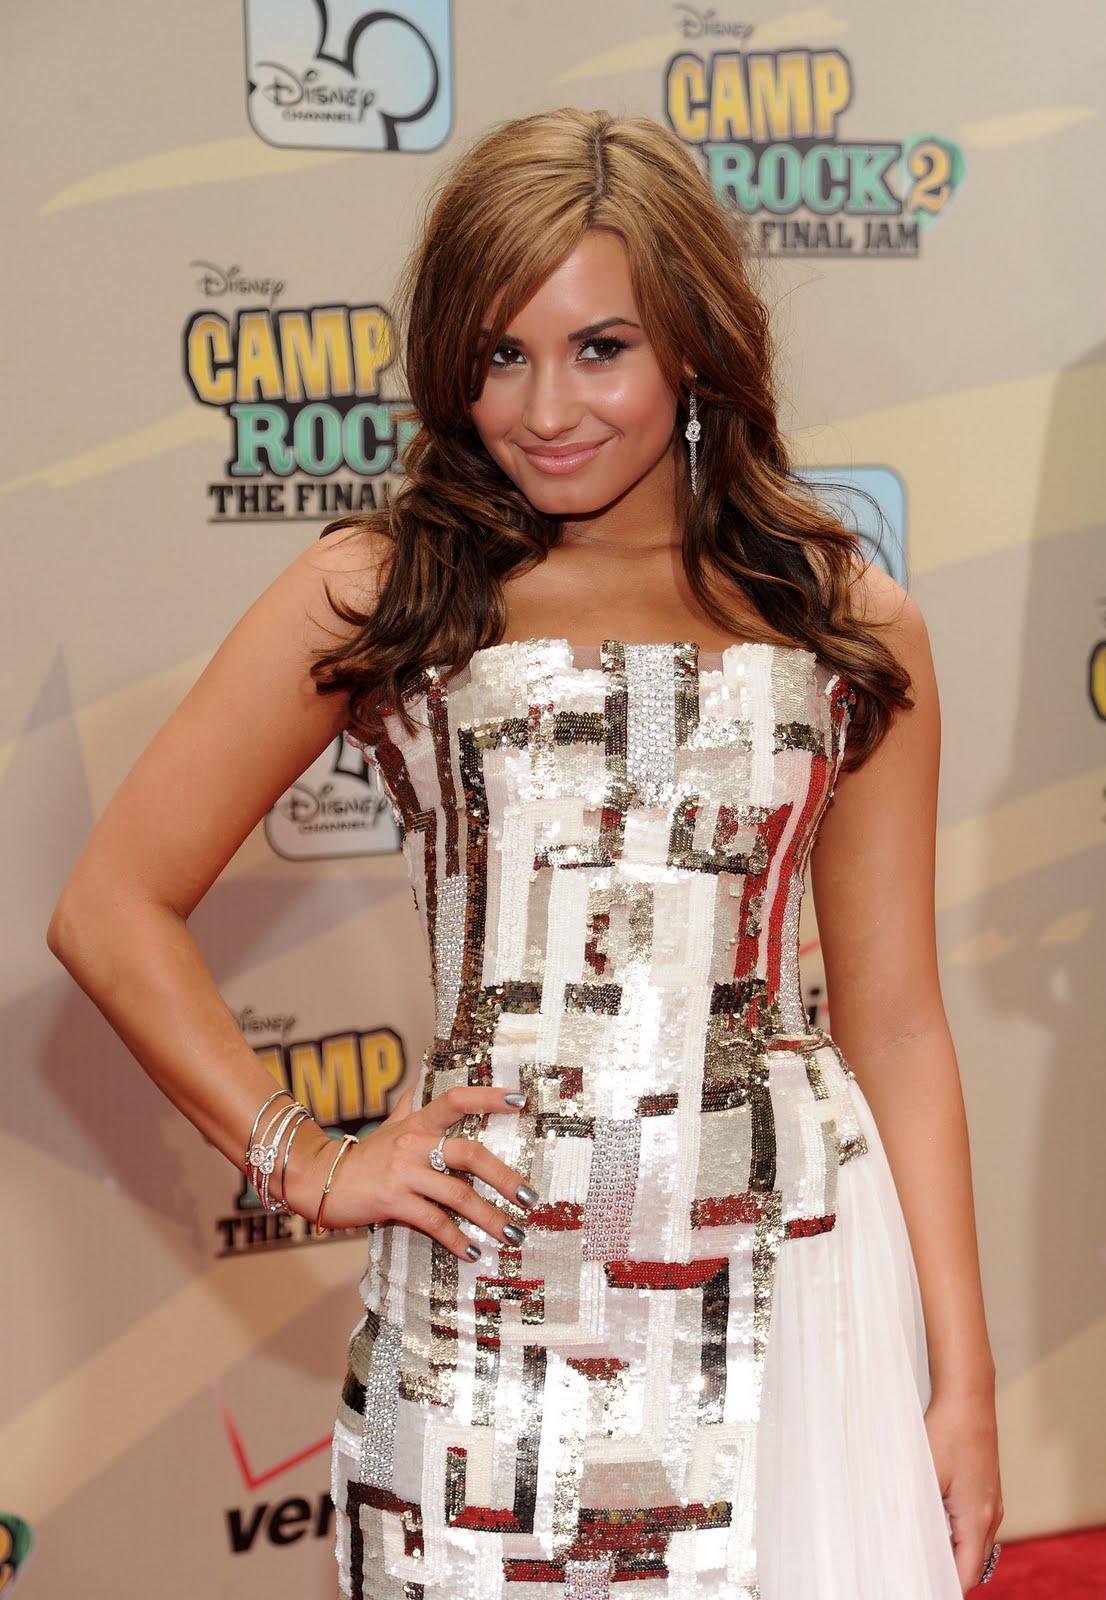 http://3.bp.blogspot.com/-2UCQ1i_hNd8/Te2J0EY5igI/AAAAAAAAAiw/1NwDKQEdJWI/s1600/79501_Tikipeter_Demi_Lovato_Camp_Rock_1_009_122_1095lo.jpg